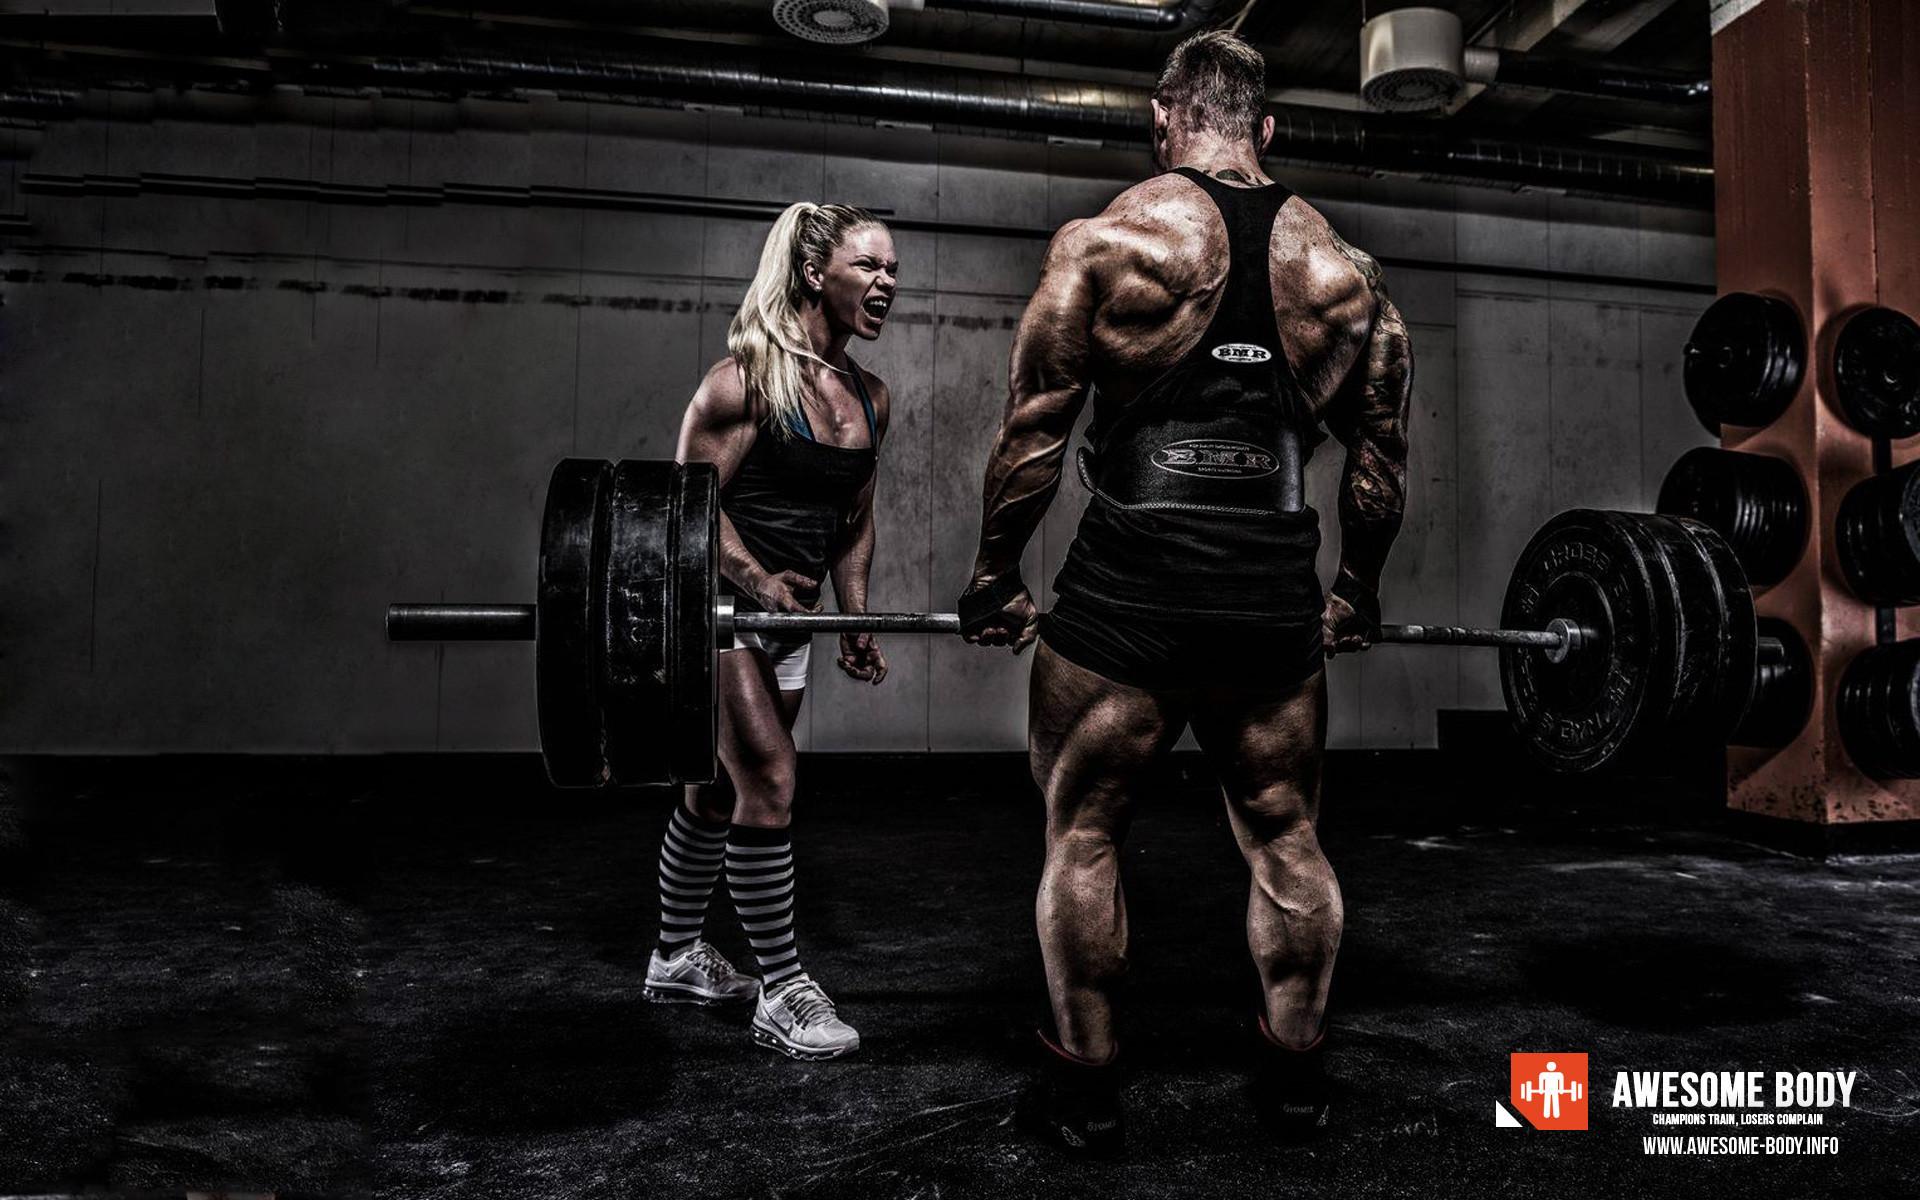 Dead Lift Wallpaper | Best HD Bodybuilding Wallpapers